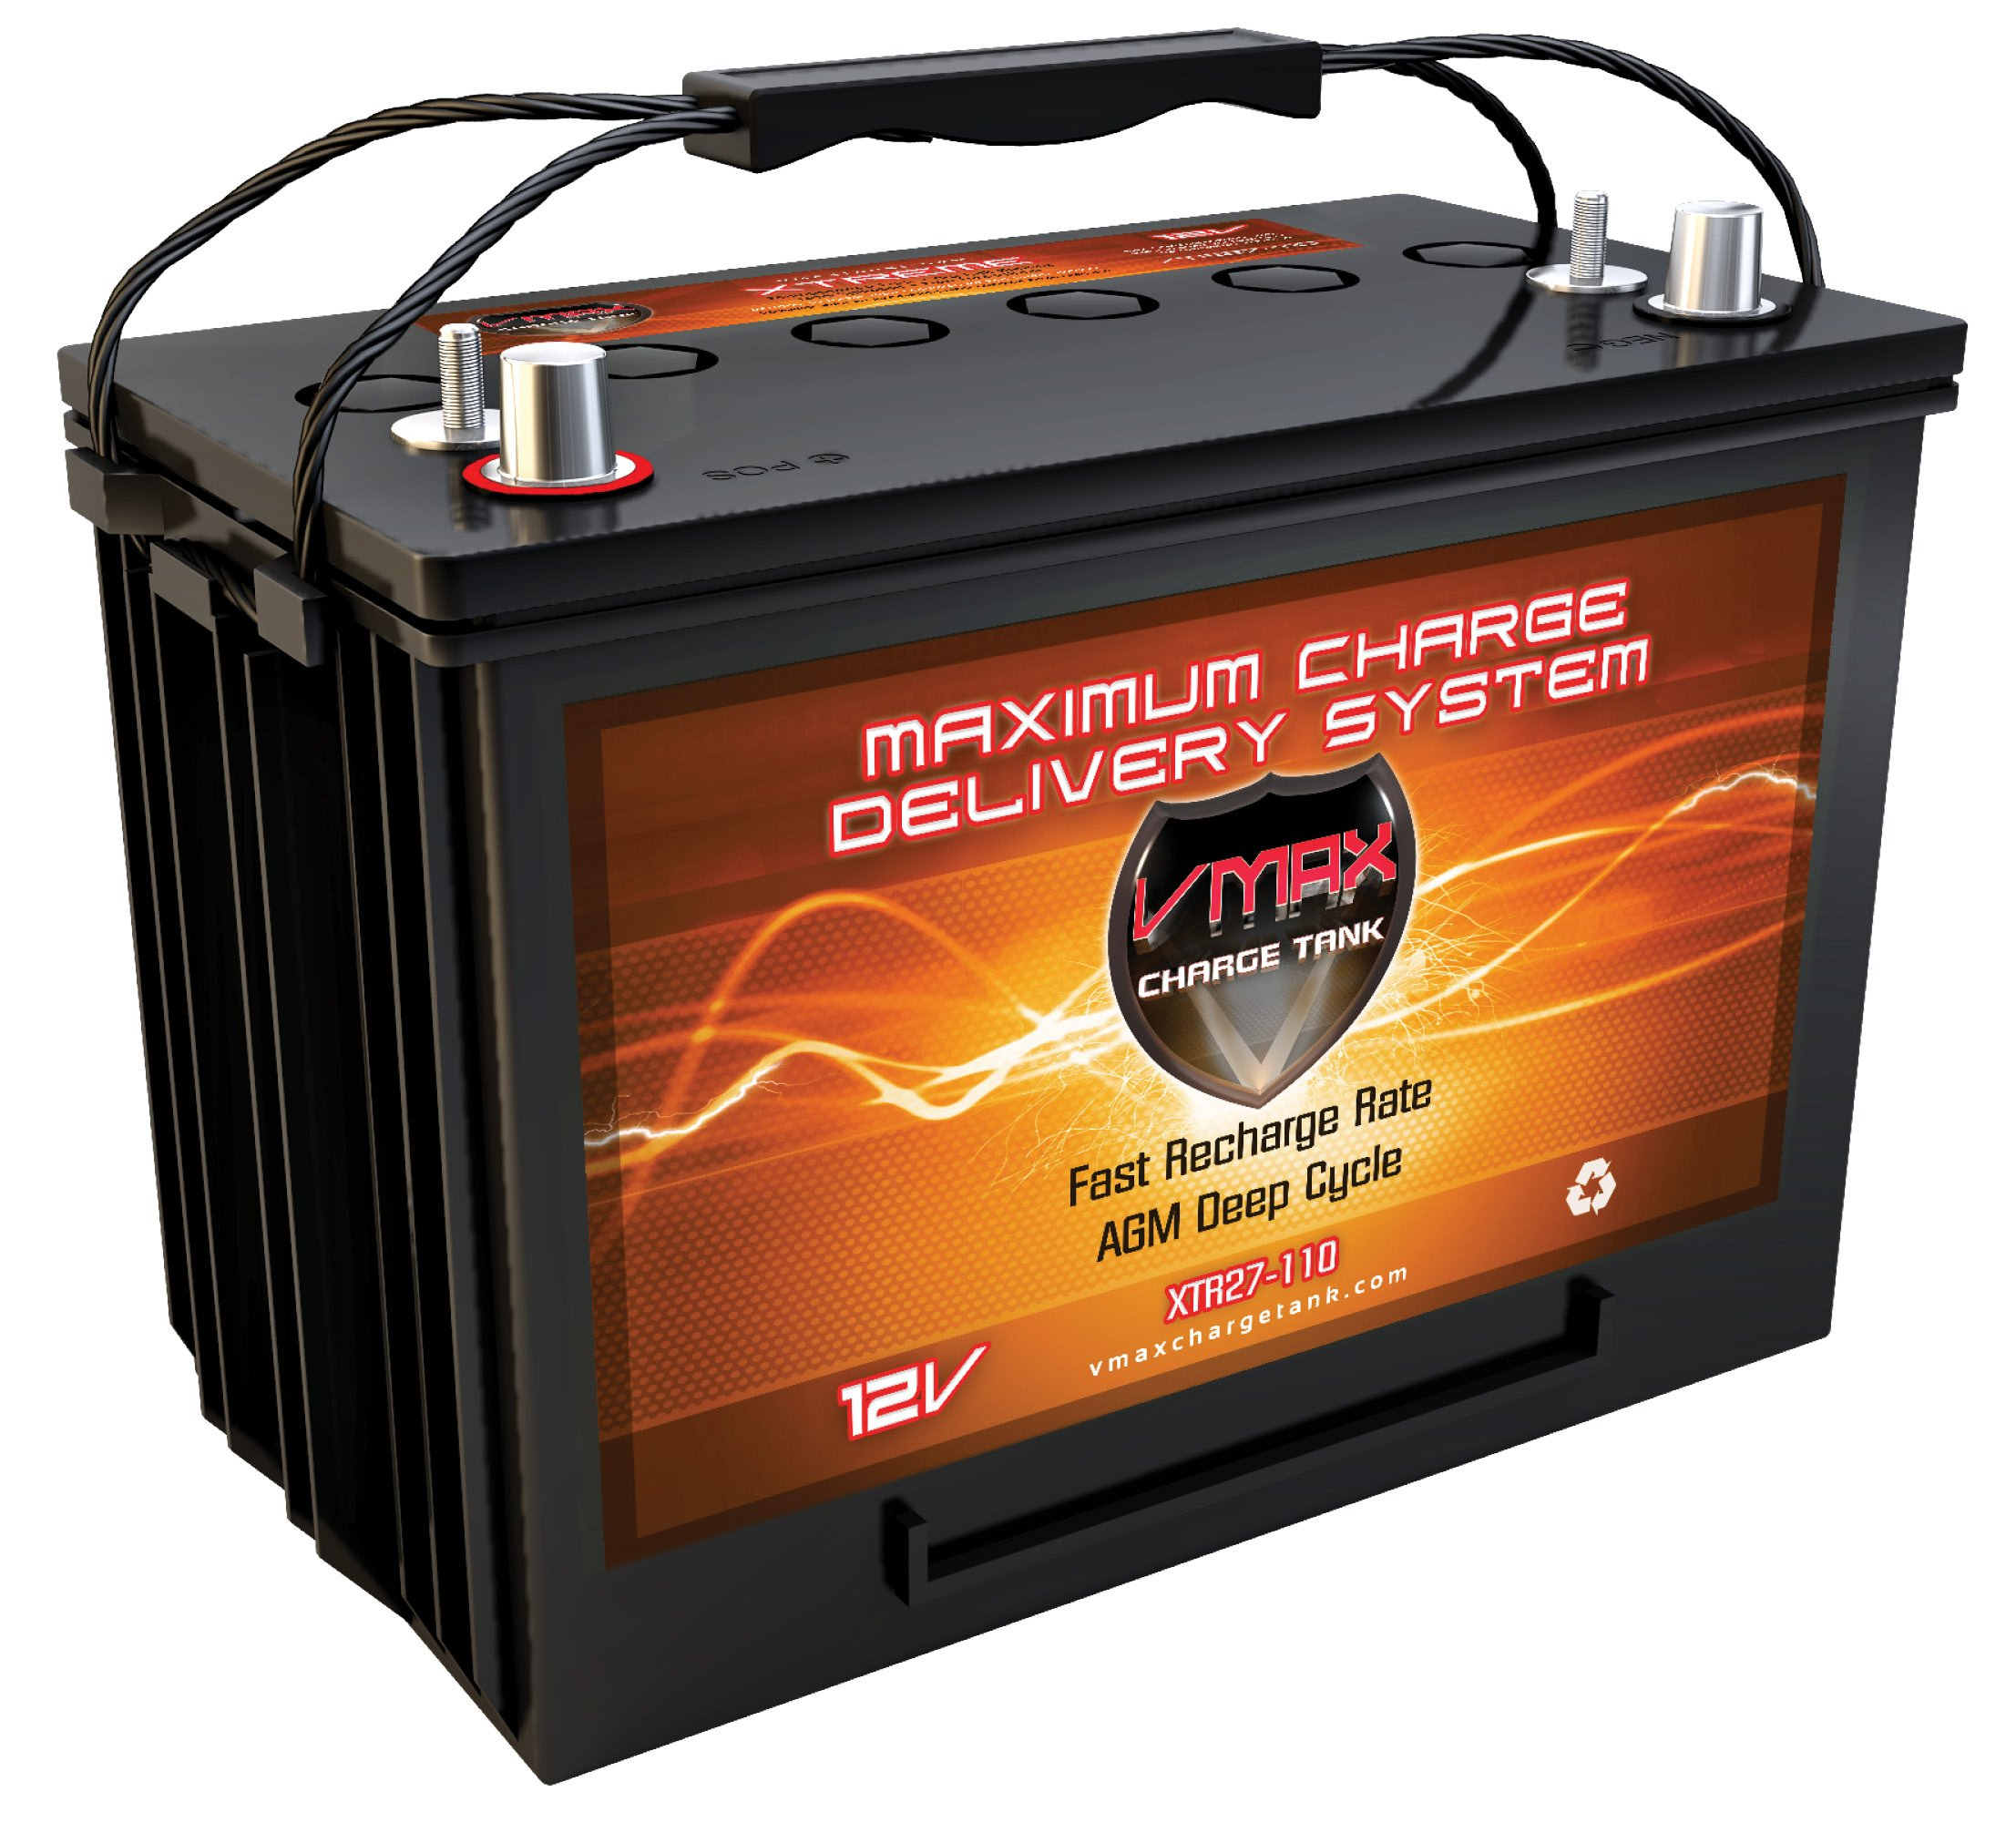 VMAX XTR27-110 AGM Marine Battery 12V 110Ah Group 27 Sealed Deep Cycle High Performance